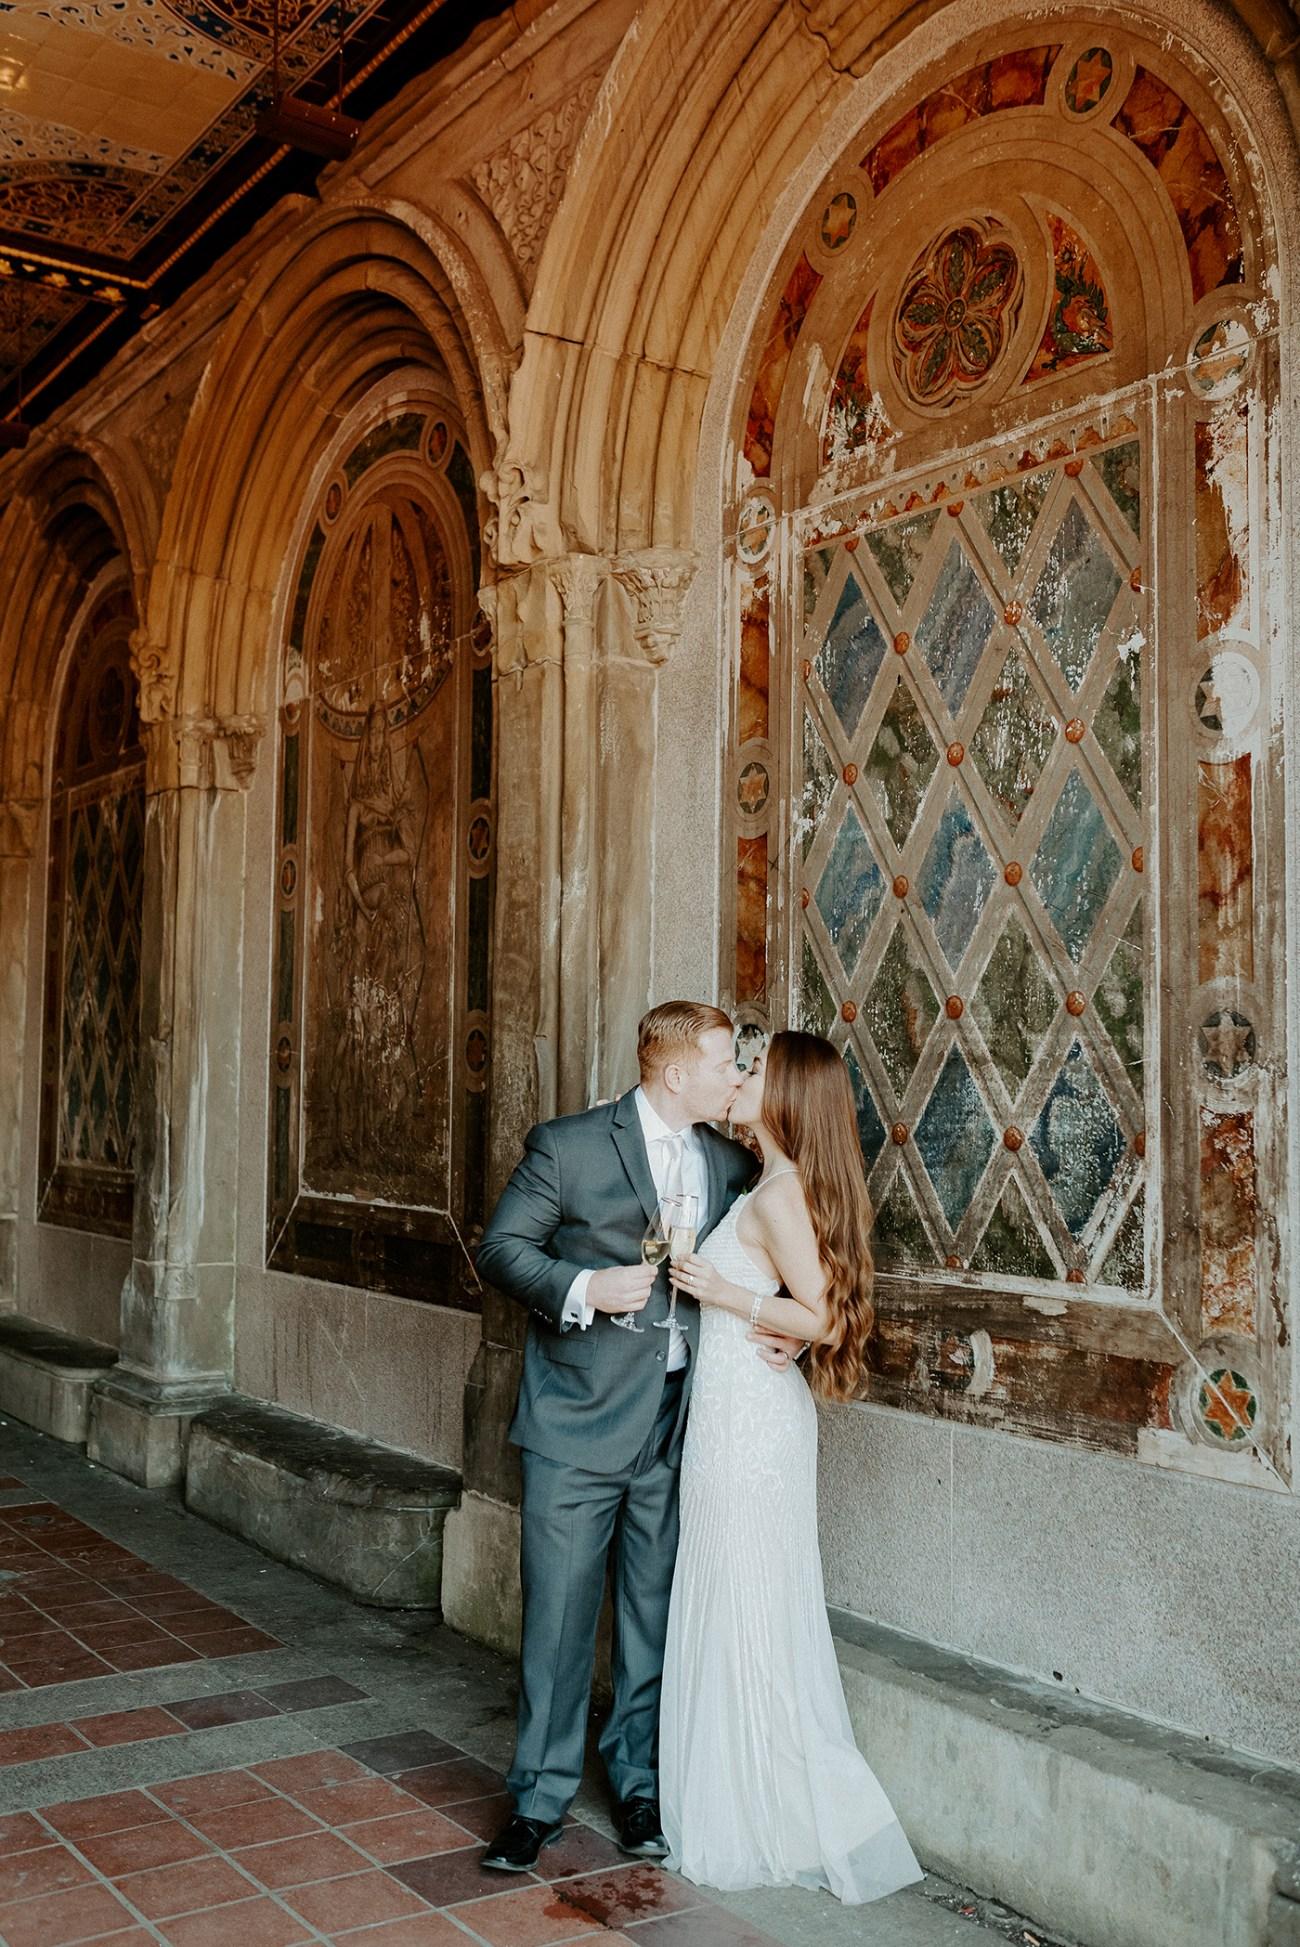 Central Park Elopement Bethesda Fountain Wedding New York Wedding Photographer 51